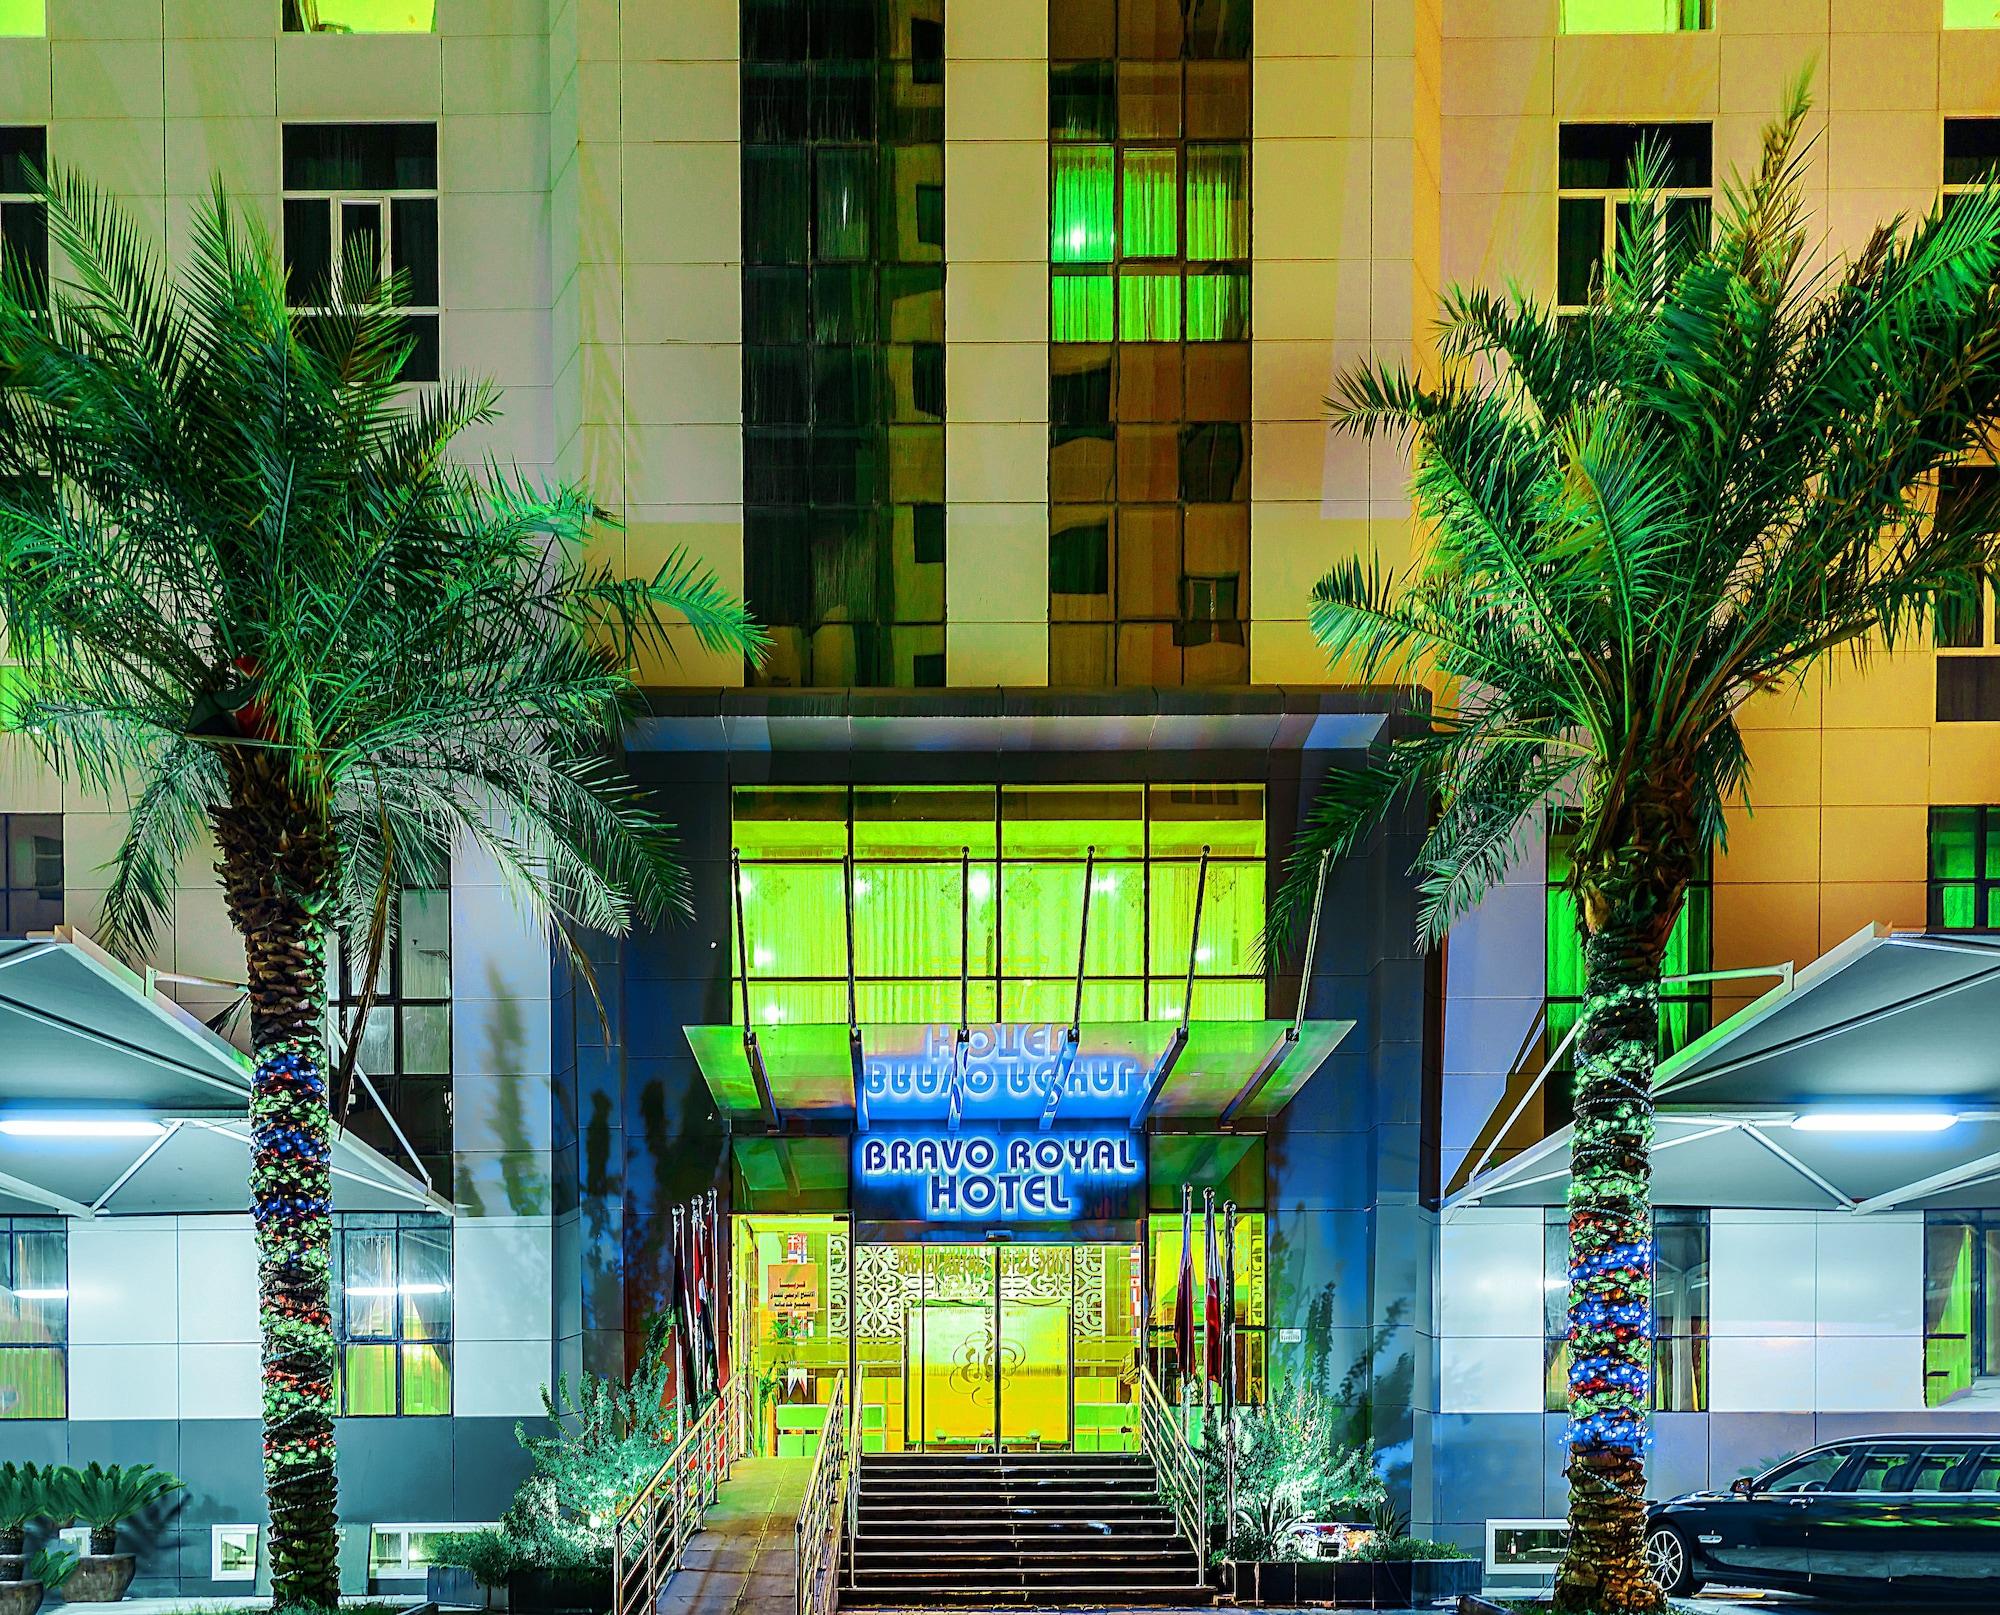 Bravo Royal Hotel Suites,